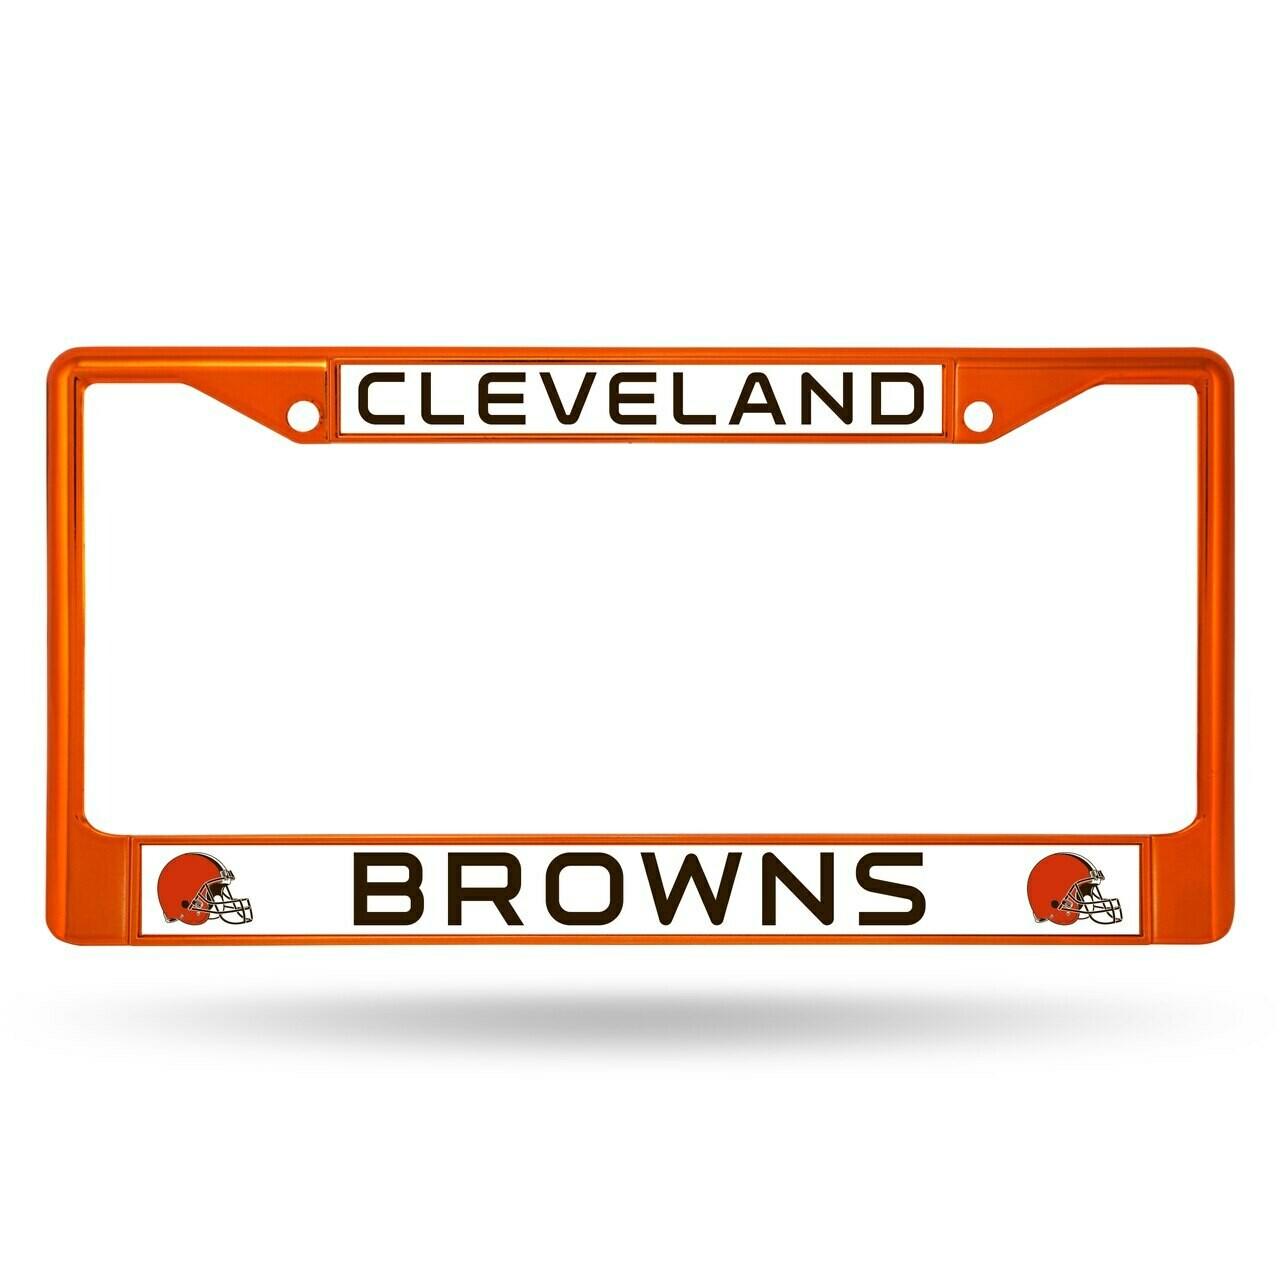 Cleveland Browns Chrome License Plate Frame